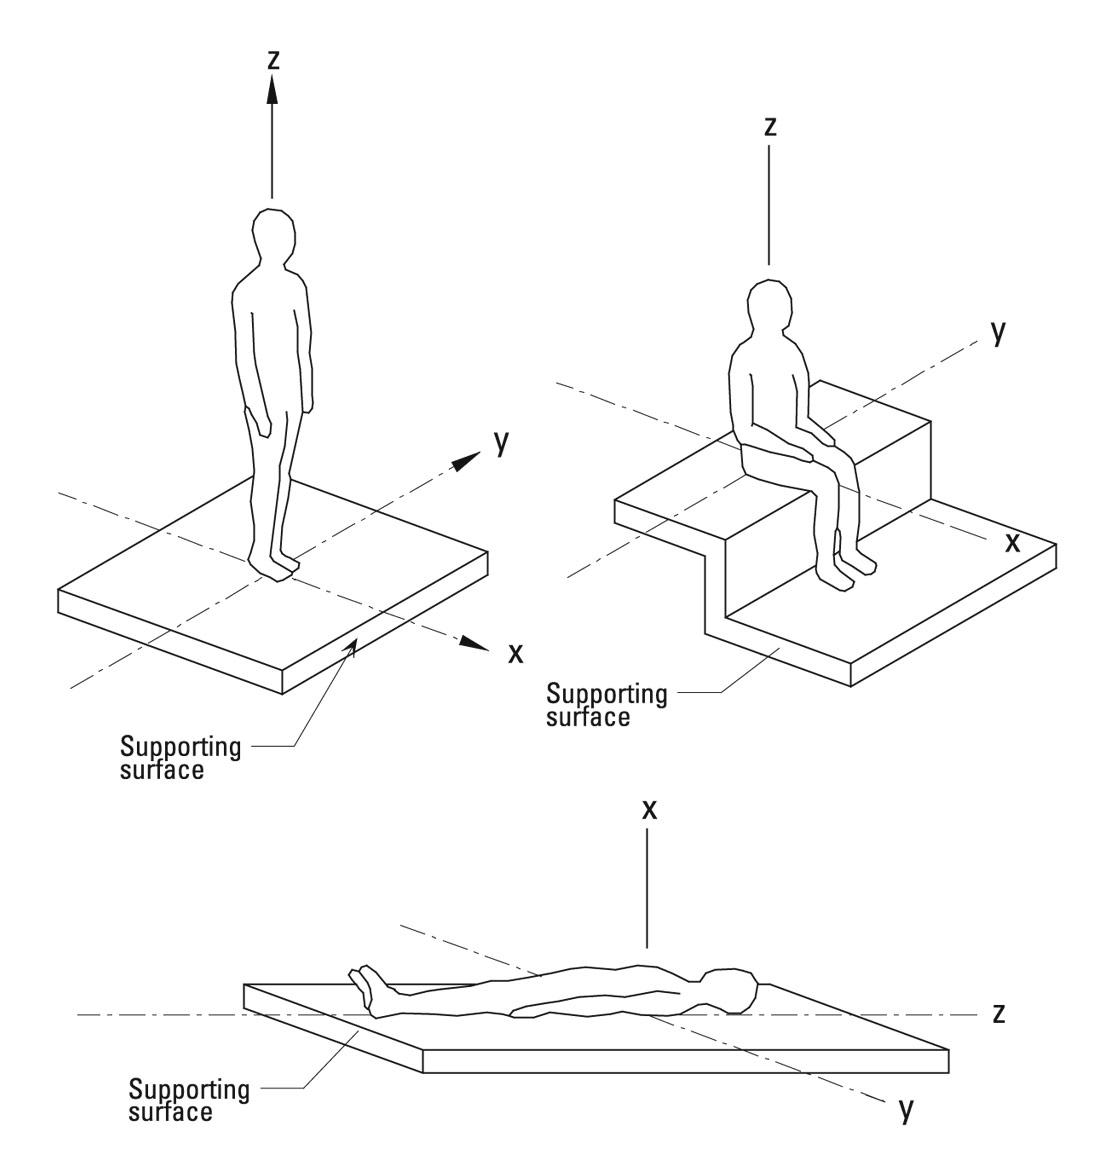 The real vibration performance of modern steel-framed floors